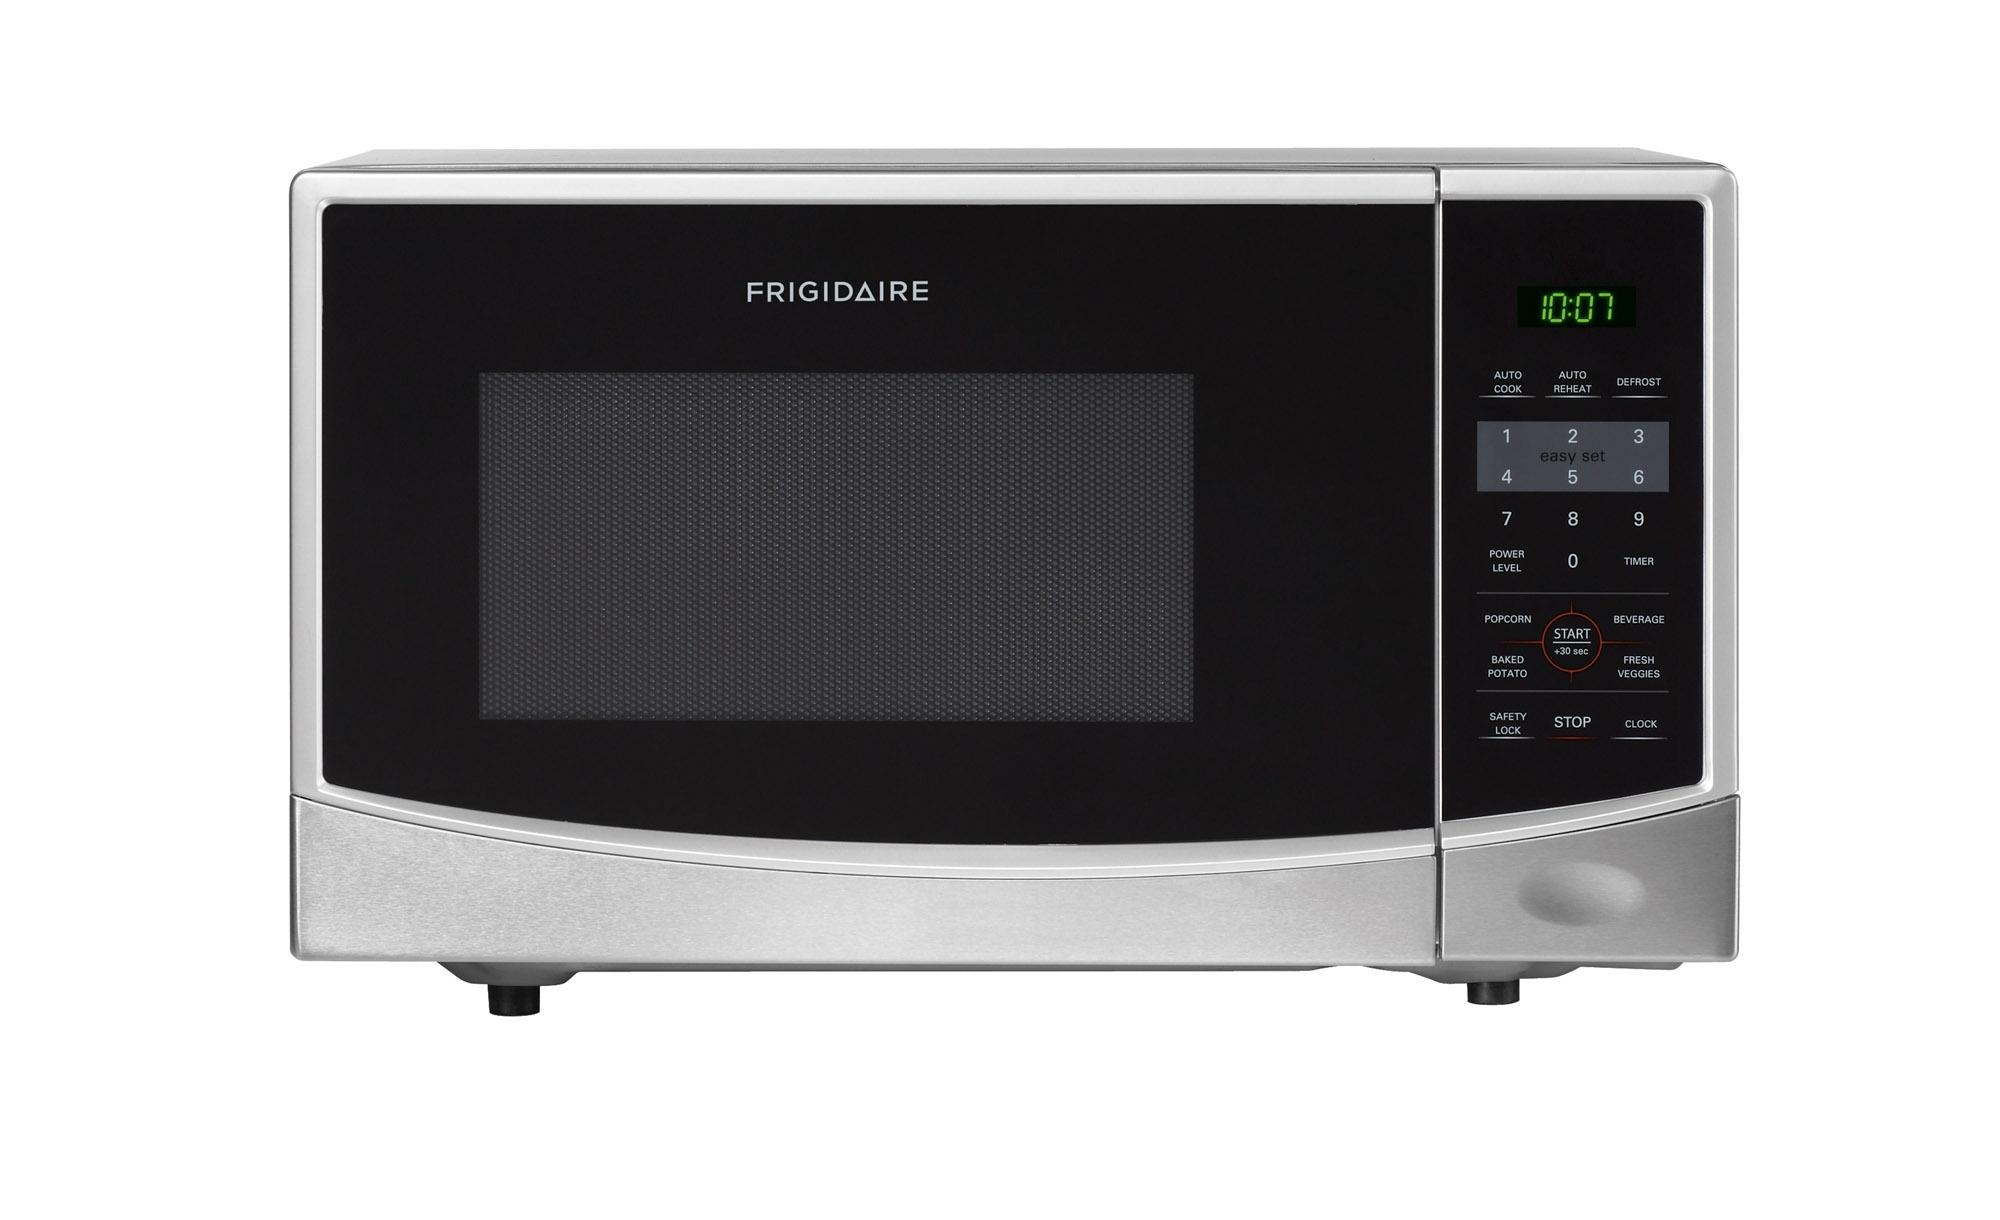 Ffcm0934l Frigidaire Ffcm0934l Countertop Microwaves